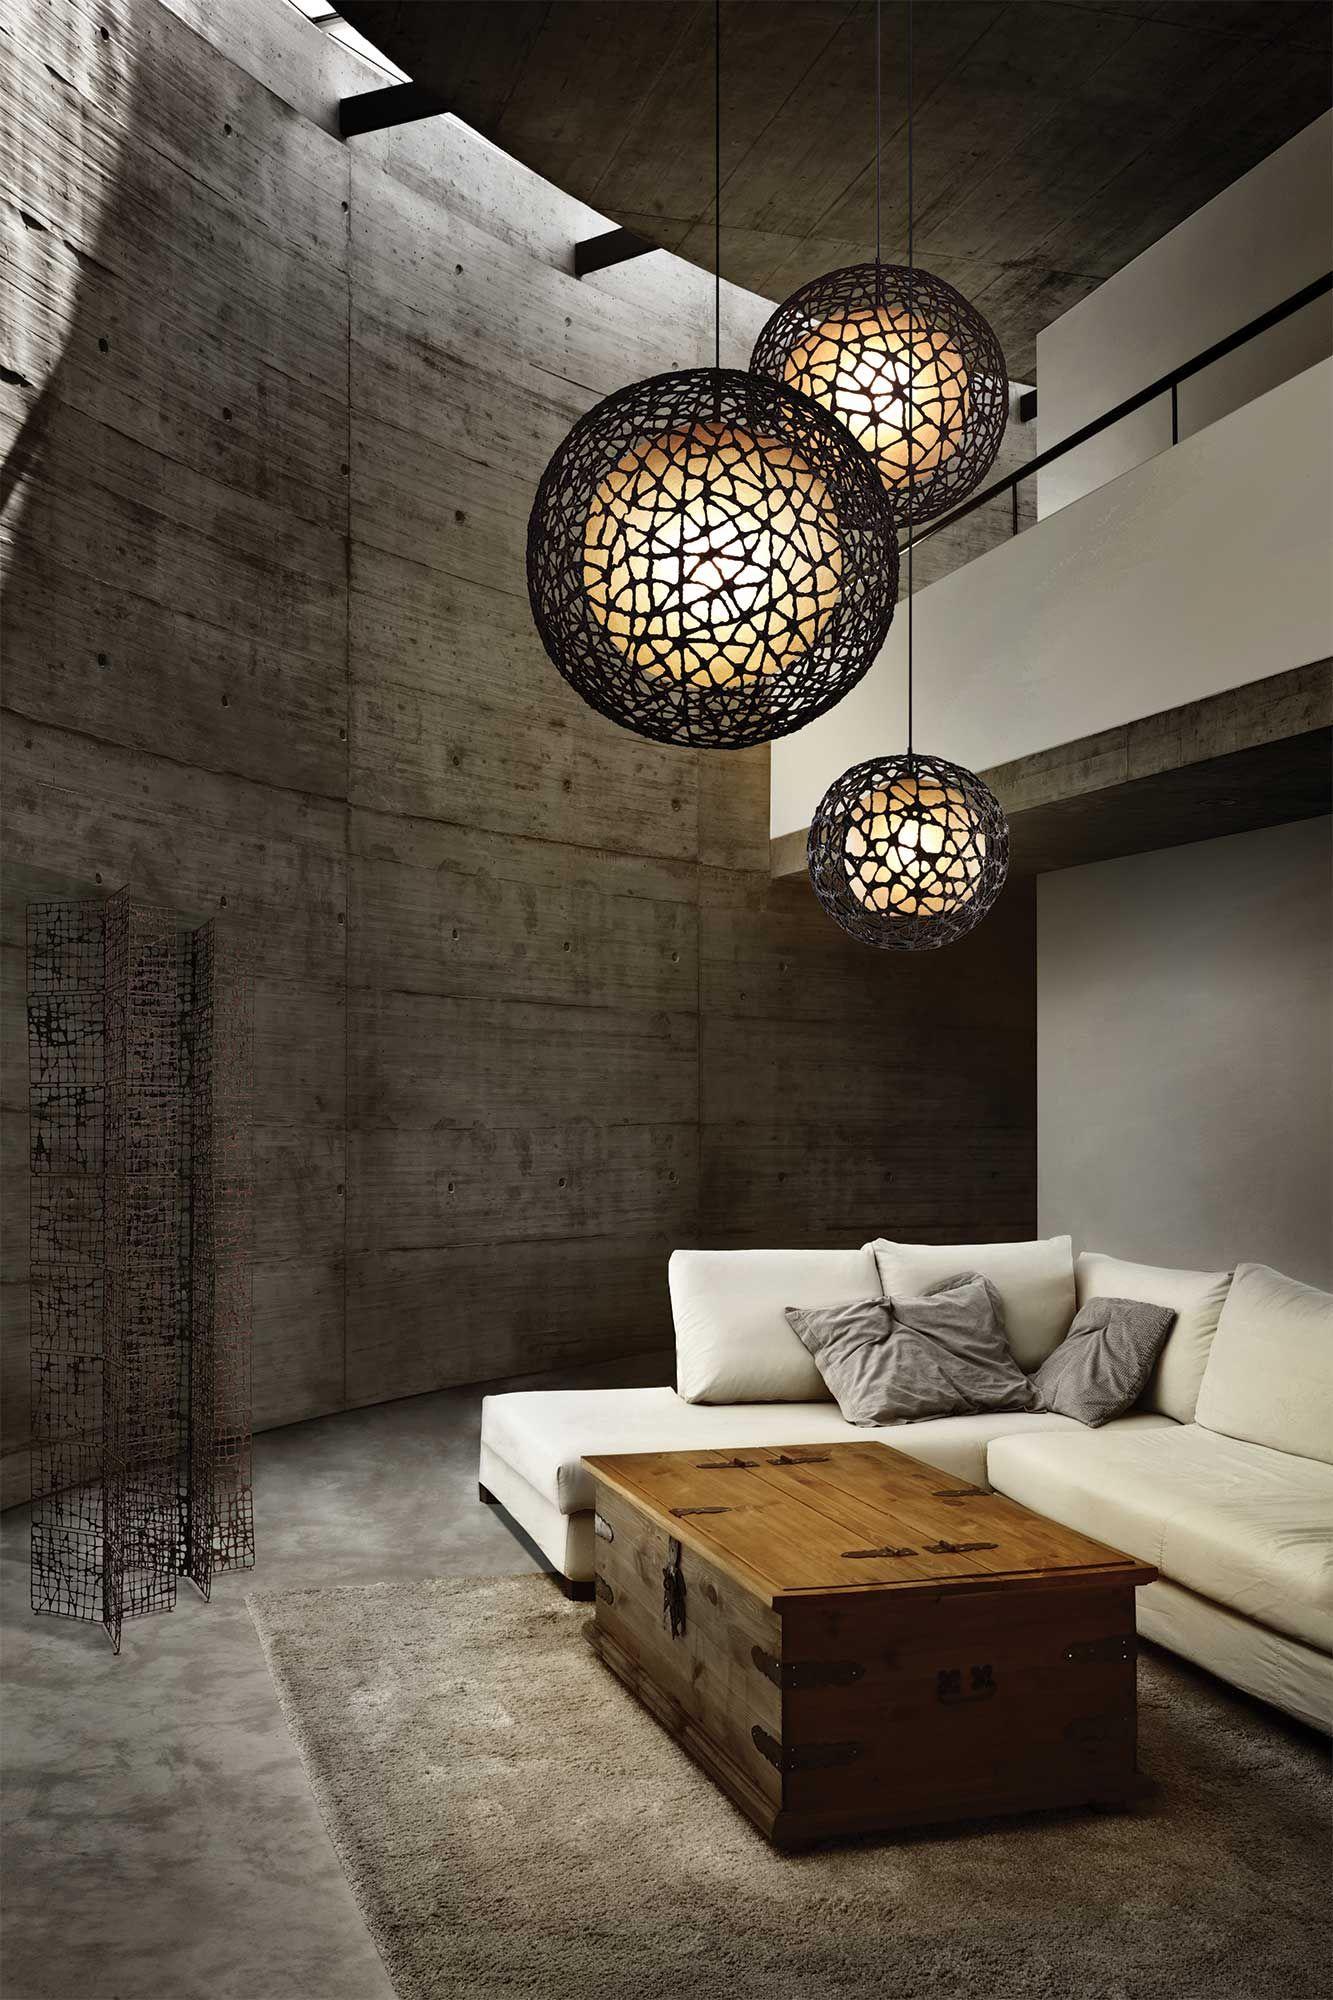 Hanging Light Fixtures Living Room White C U Me Round Pendant Architects Pinterest Lighting Lamp Design By Hive At Lightology